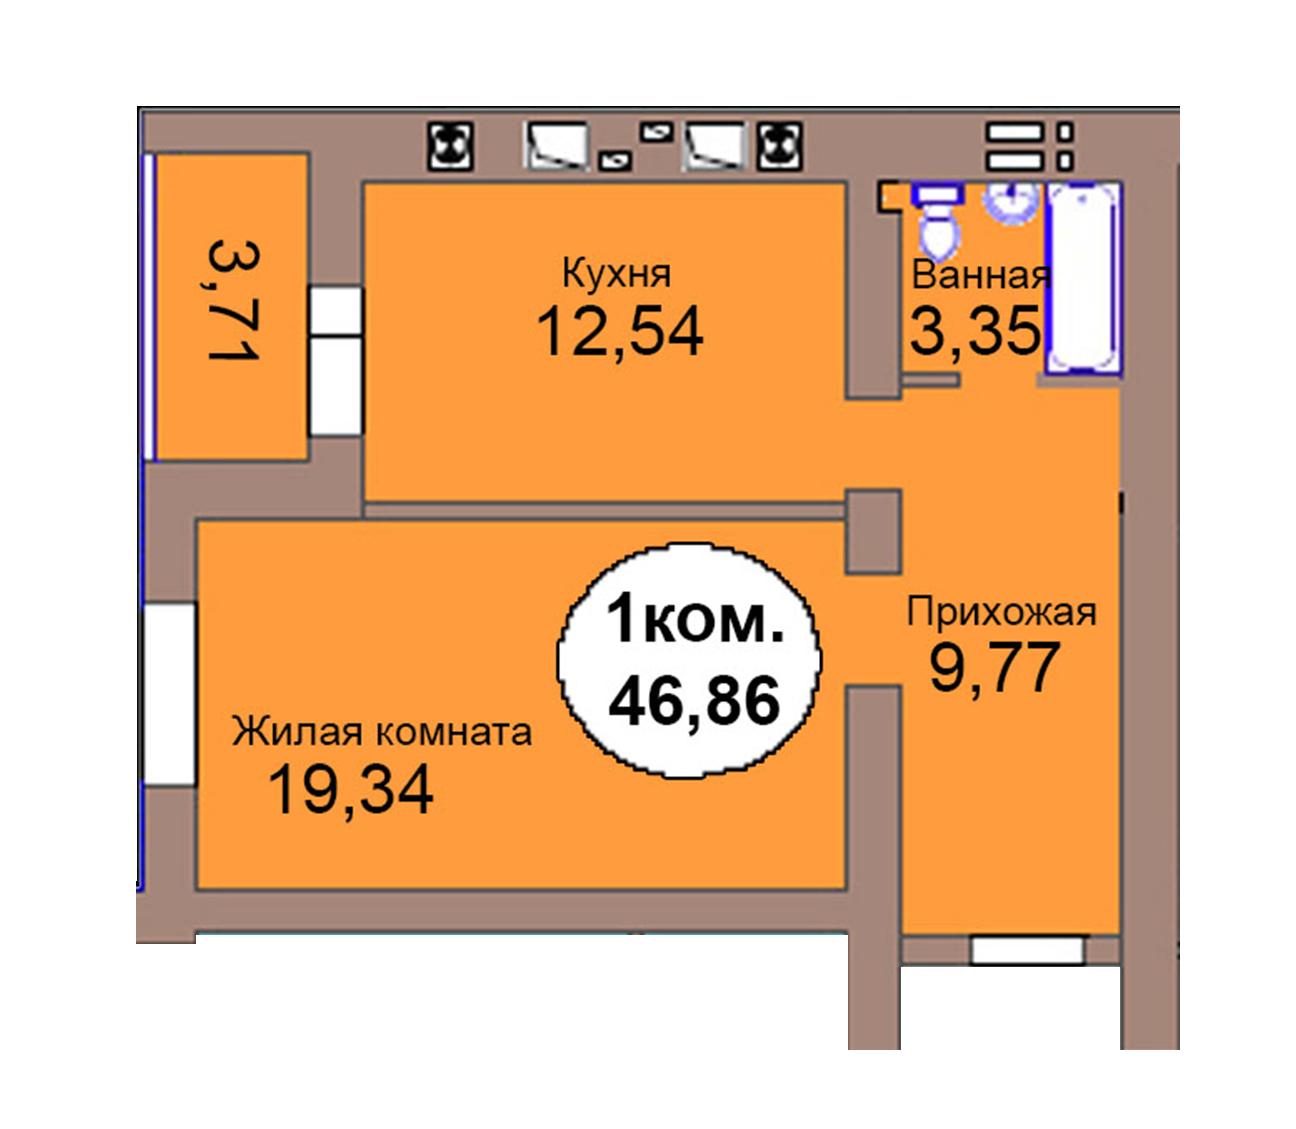 1-комн. кв. по пер. Калининградский, 4  кв. 113 в Калининграде